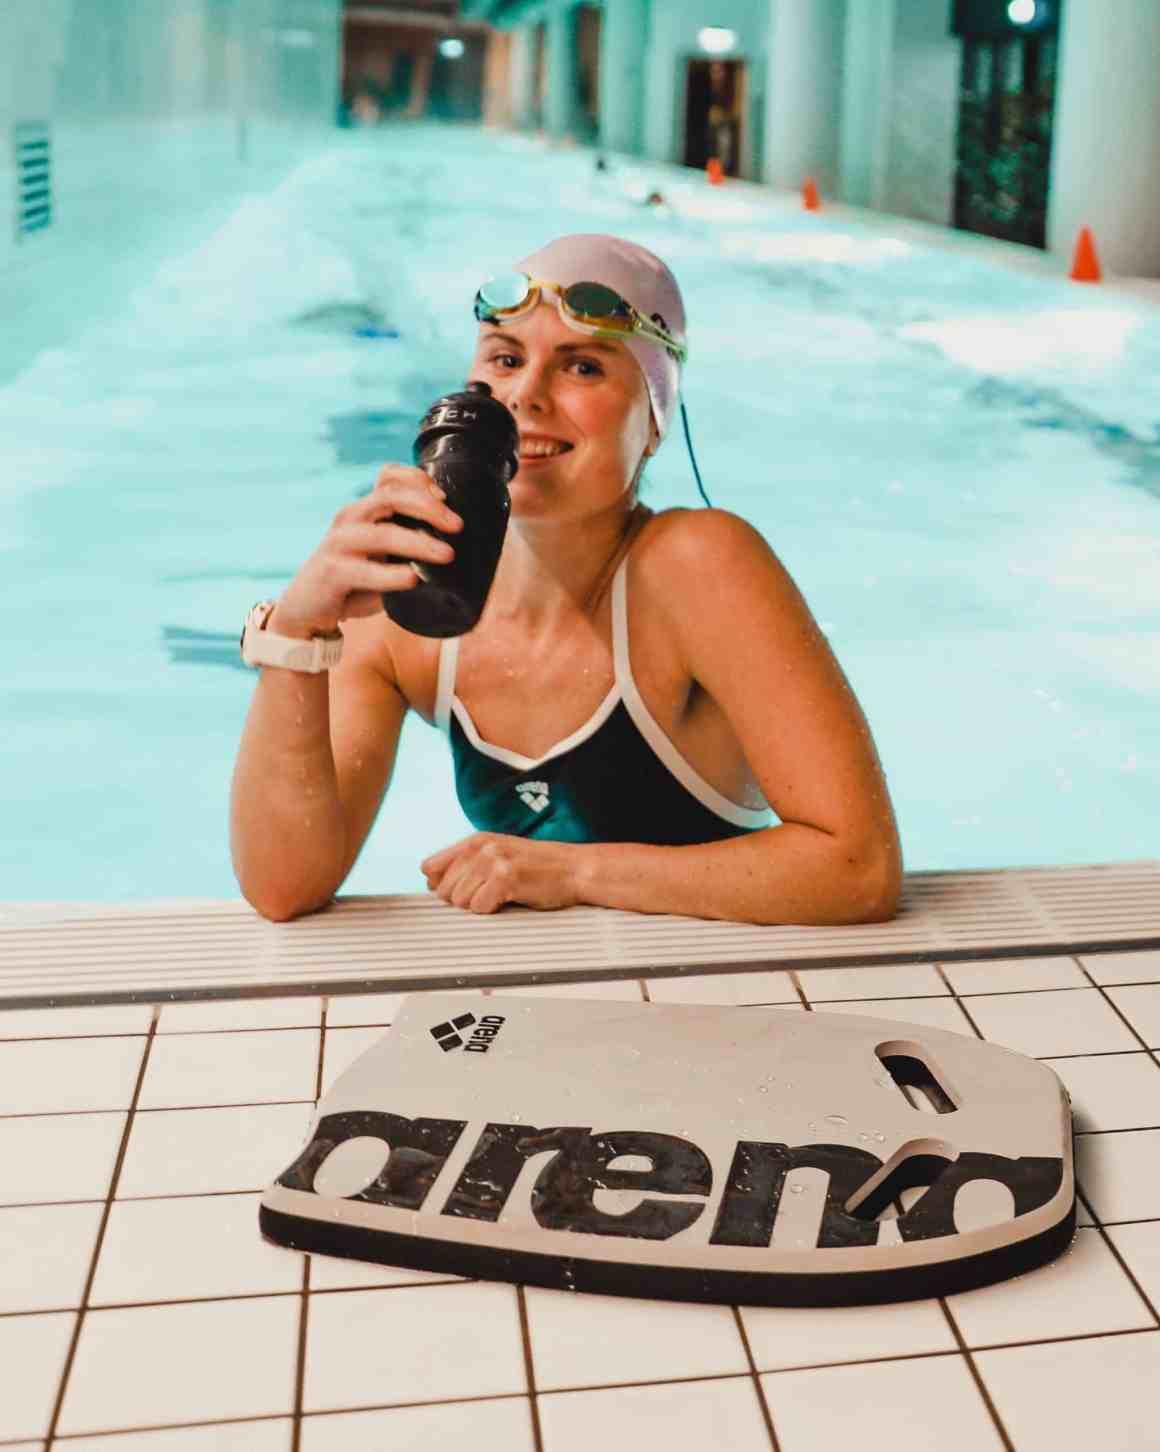 zwembad club sportive zuidas Amsterdam